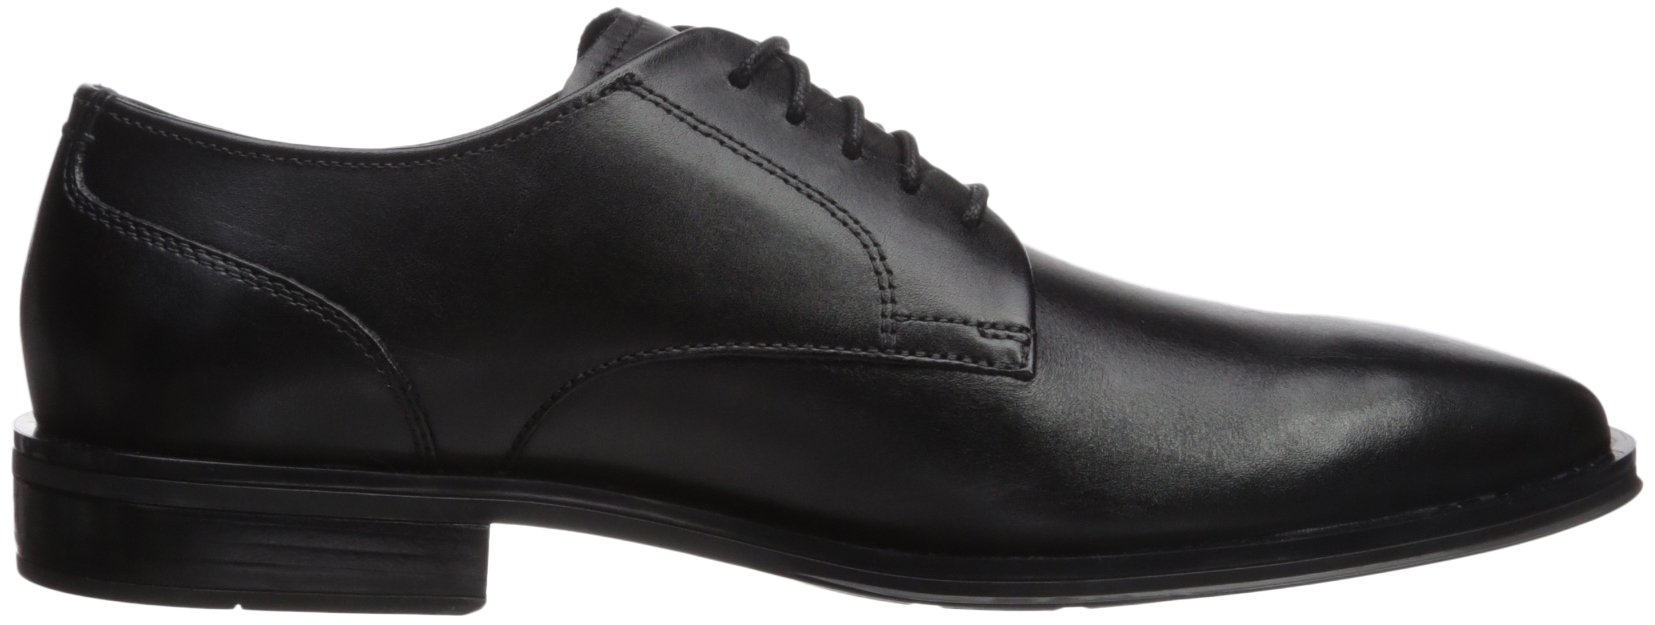 Cole Haan Men's Dawes Grand Plain Toe Oxford, Black, 11 Medium US by Cole Haan (Image #7)